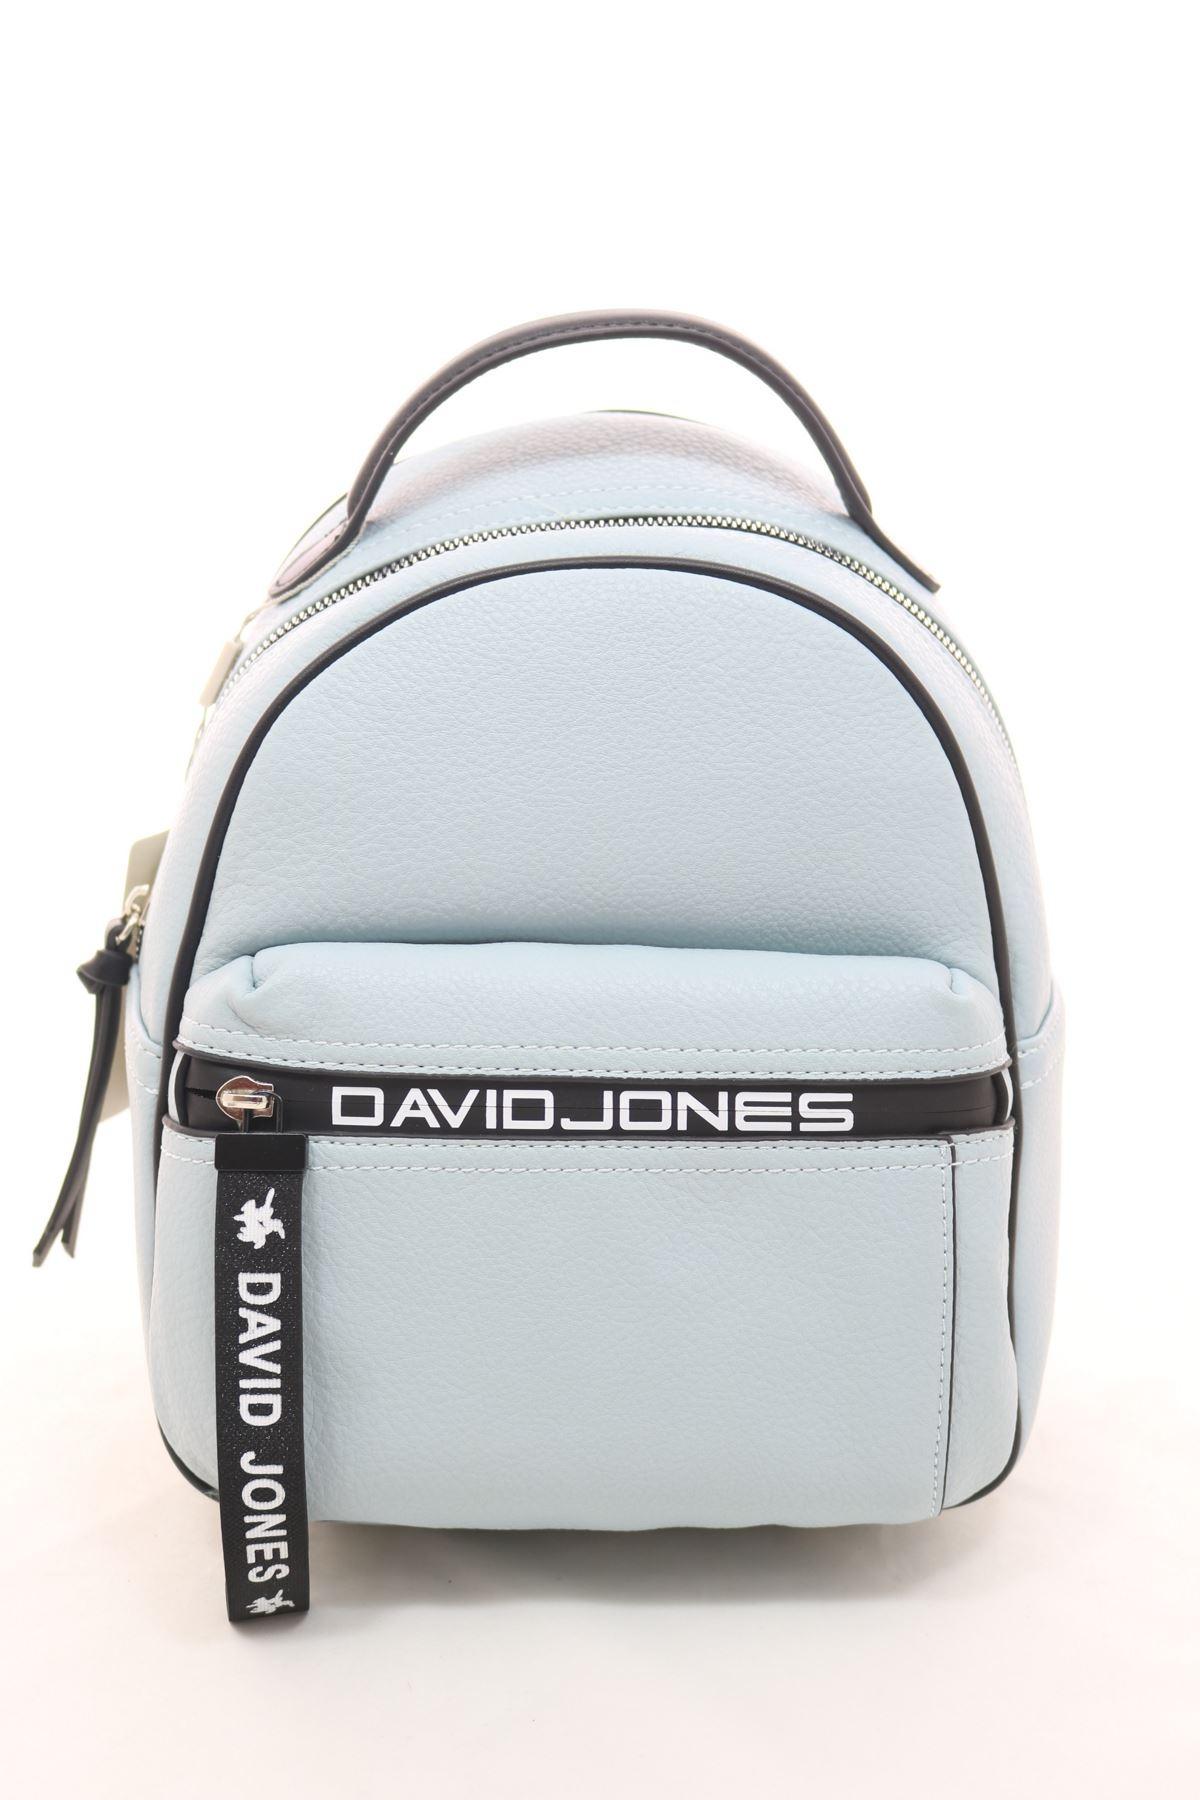 Рюкзак David Jones 5989-2 оптом